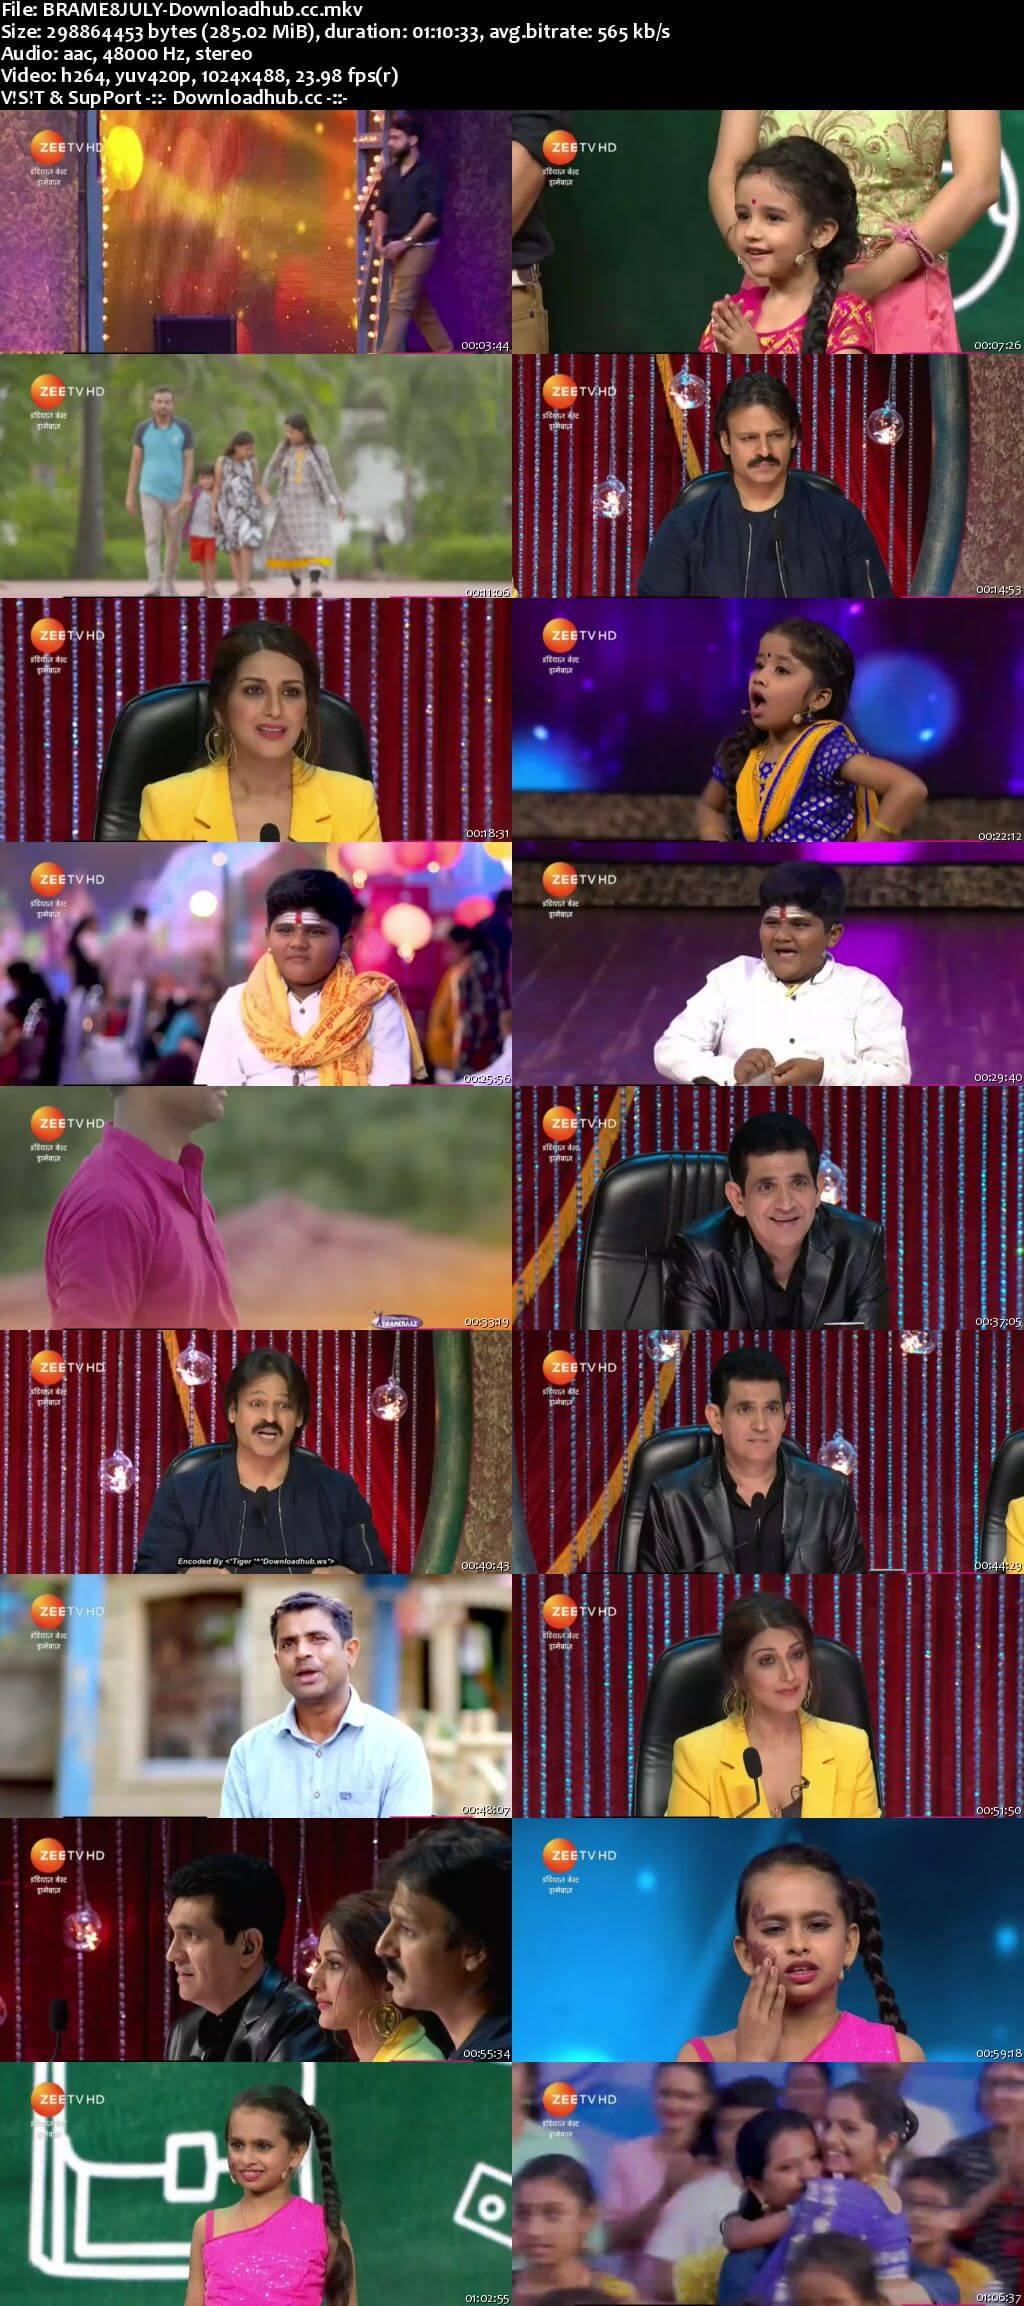 Indias Best Dramebaaz Season 3 08 July 2018 Episode 04 HDTV 480p